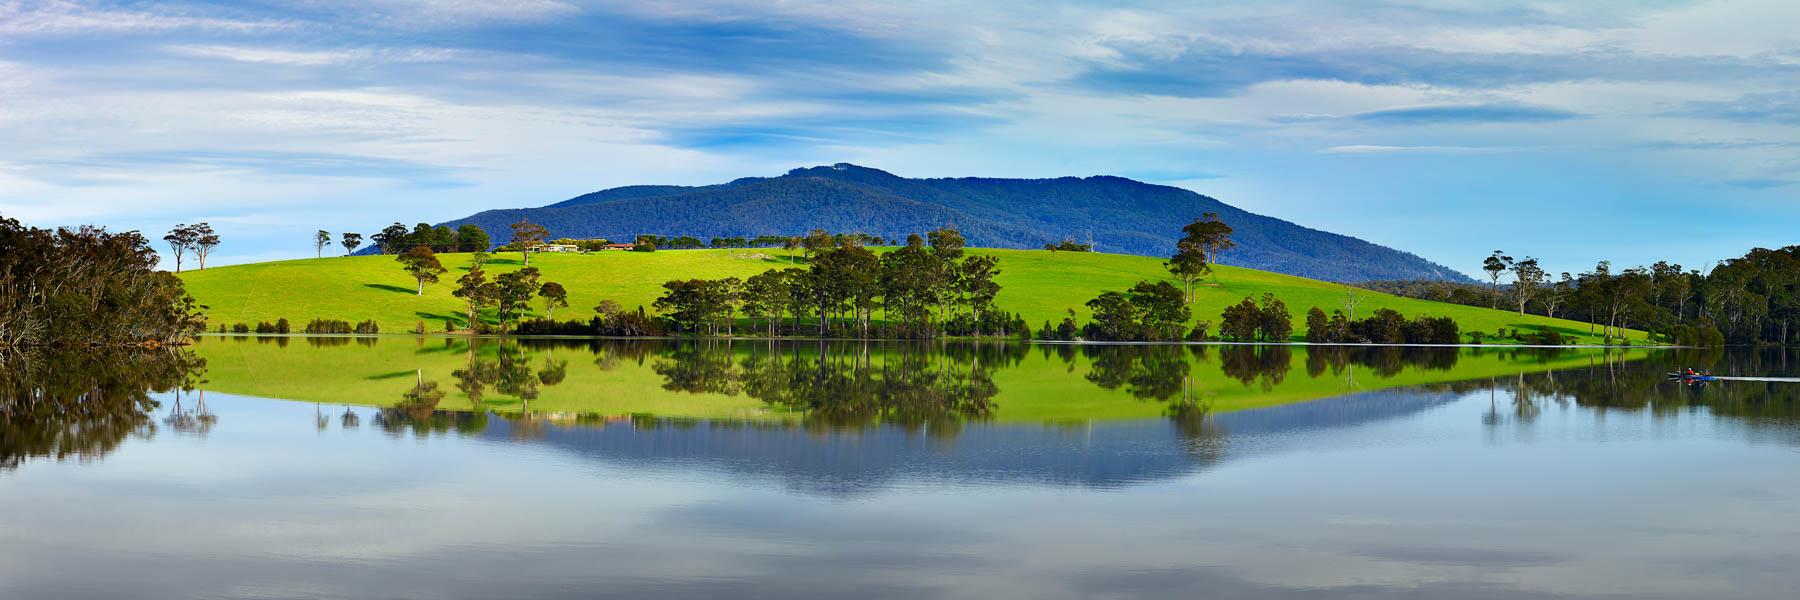 Perfect reflections in Corunna Lake, near Narooma, NSW, Australia.